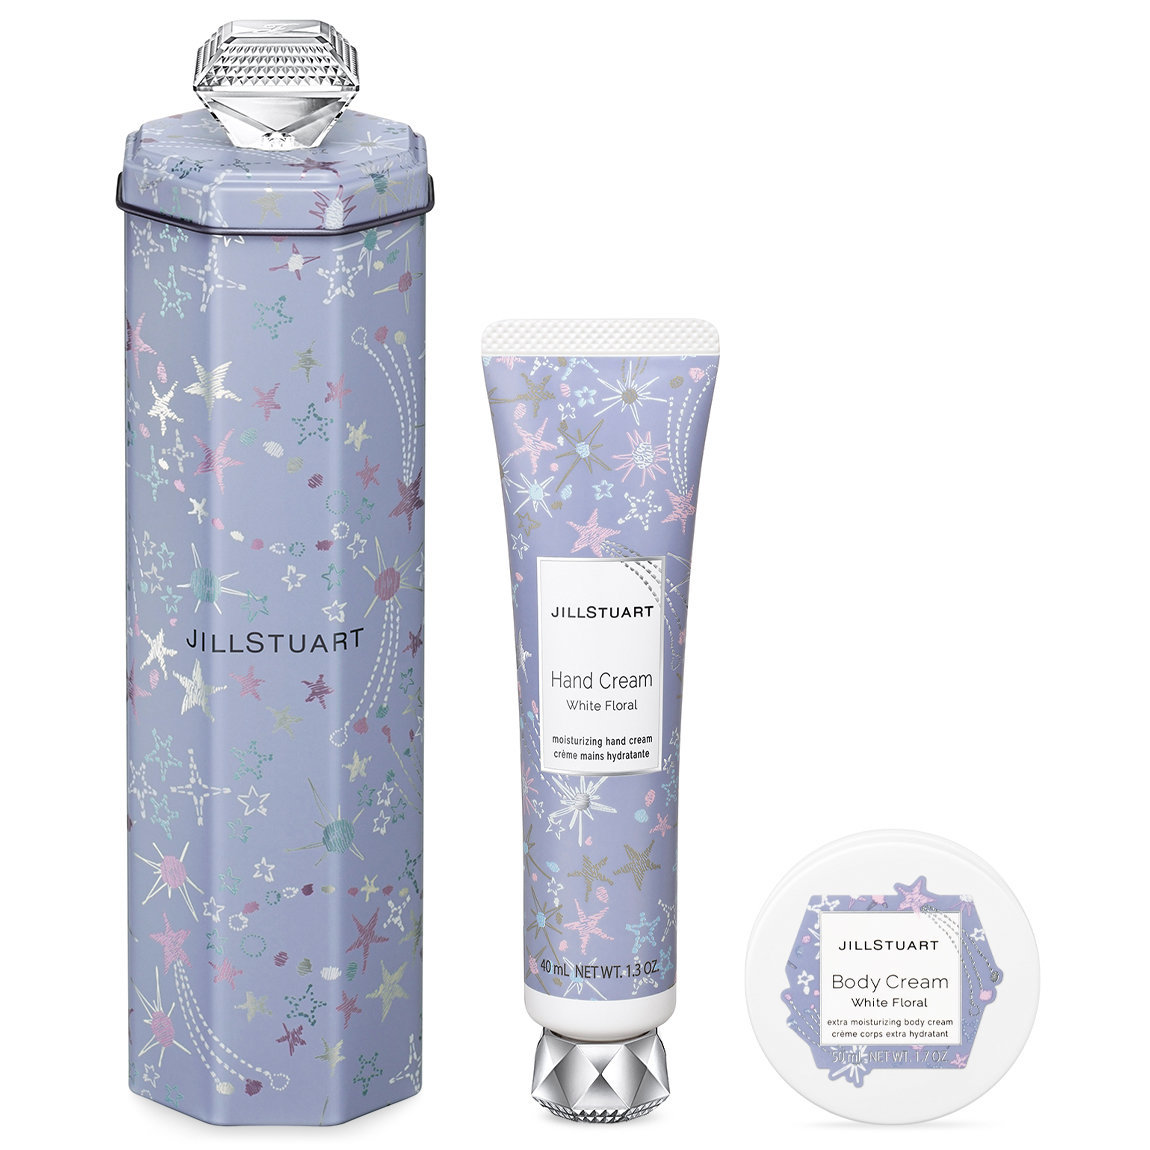 JILL STUART Beauty Dreamy Stars Gift Body Cream & Hand Cream White Floral alternative view 1 - product swatch.